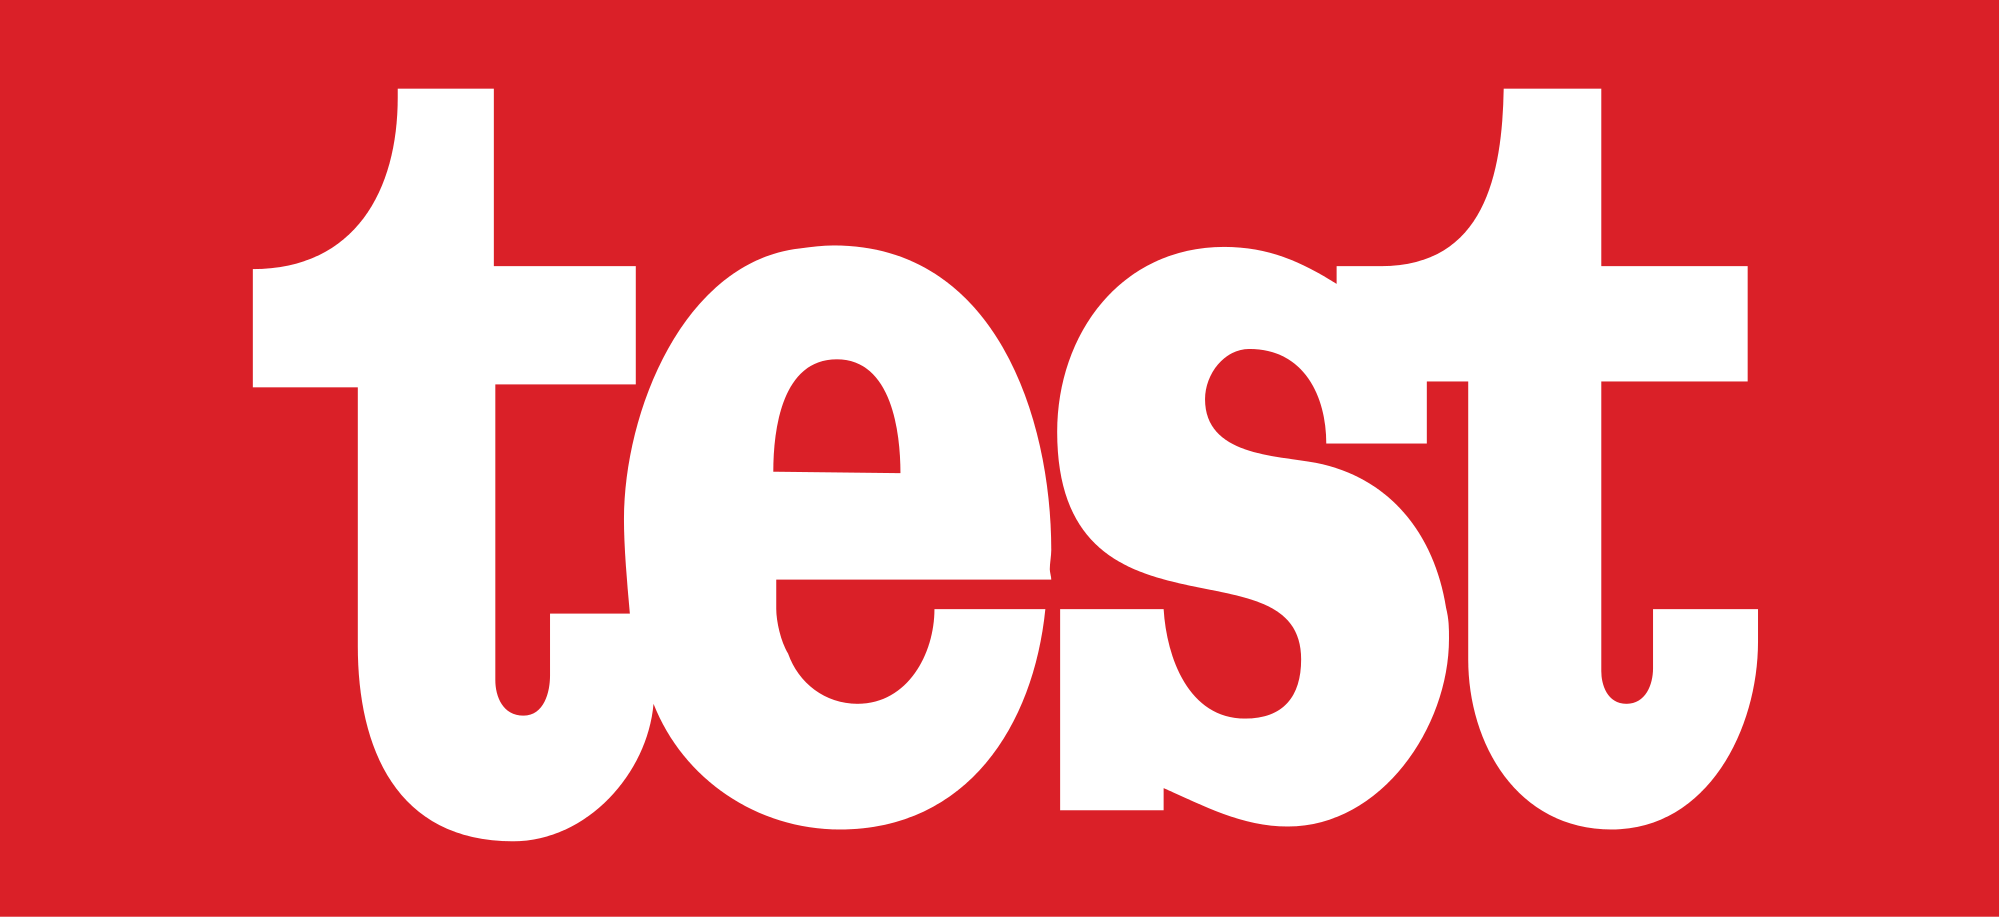 test-big.png